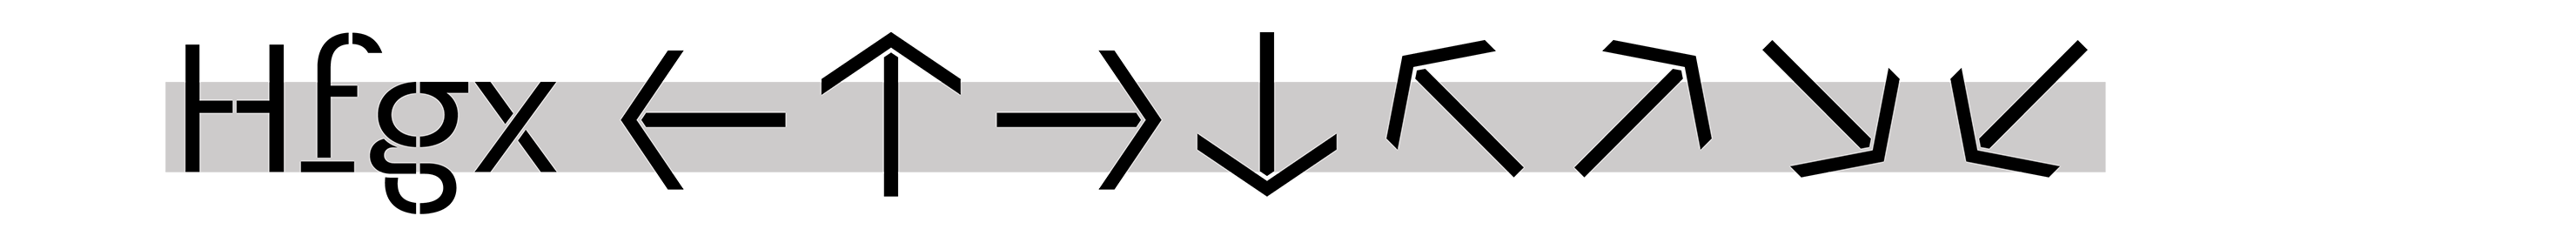 Typeface-Heimat-Stencil-F18-Atlas-Font-Foundry